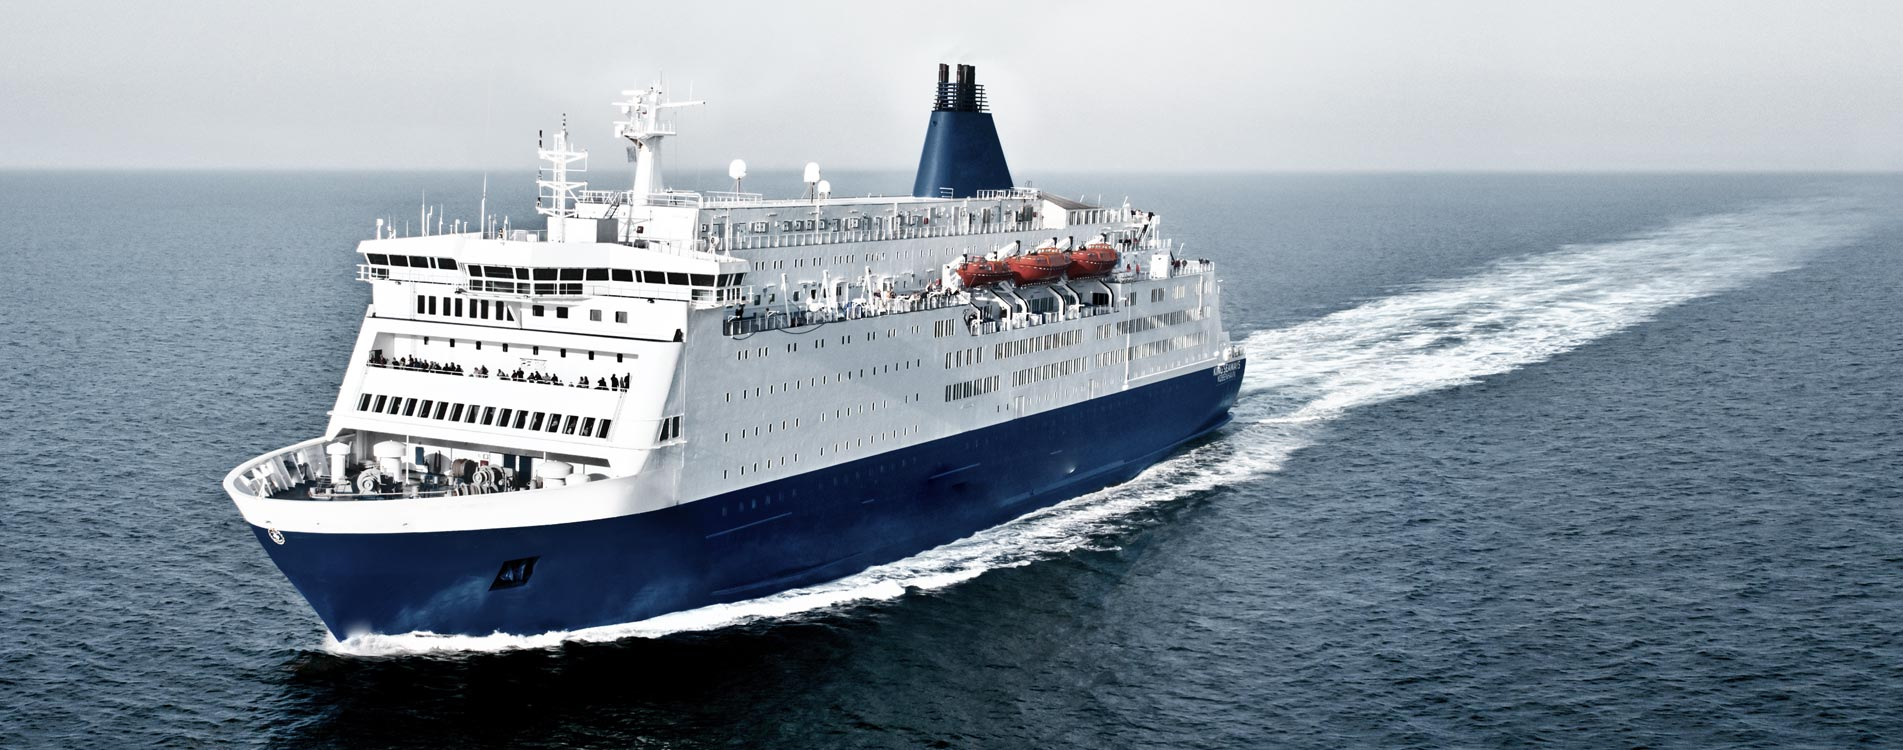 Home - Ferrybookings